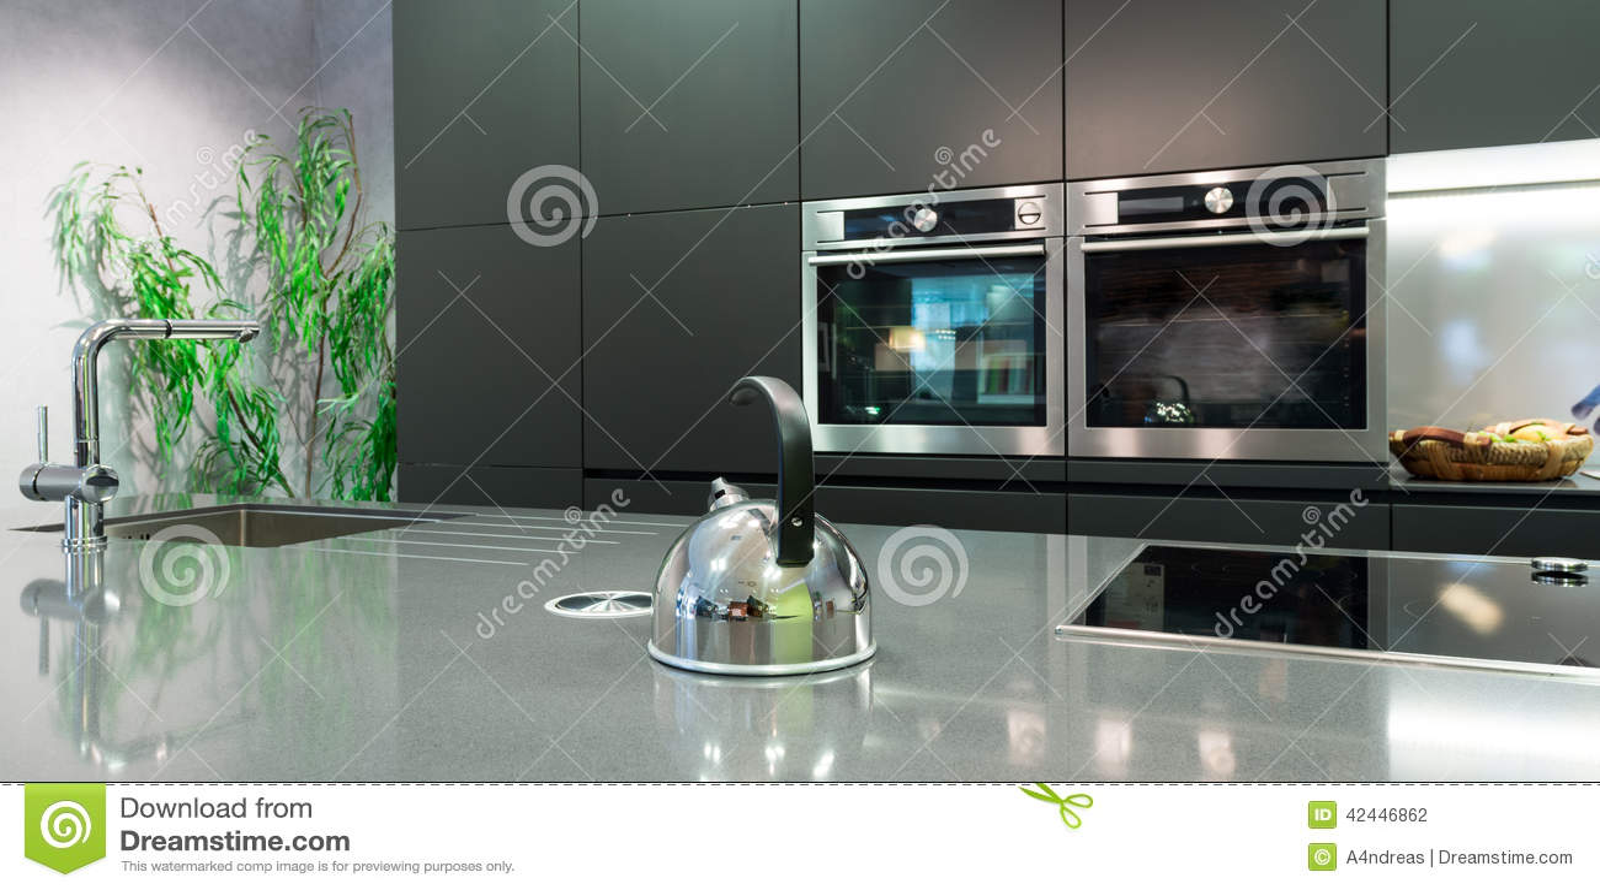 Detail over work plate of modern kitchen